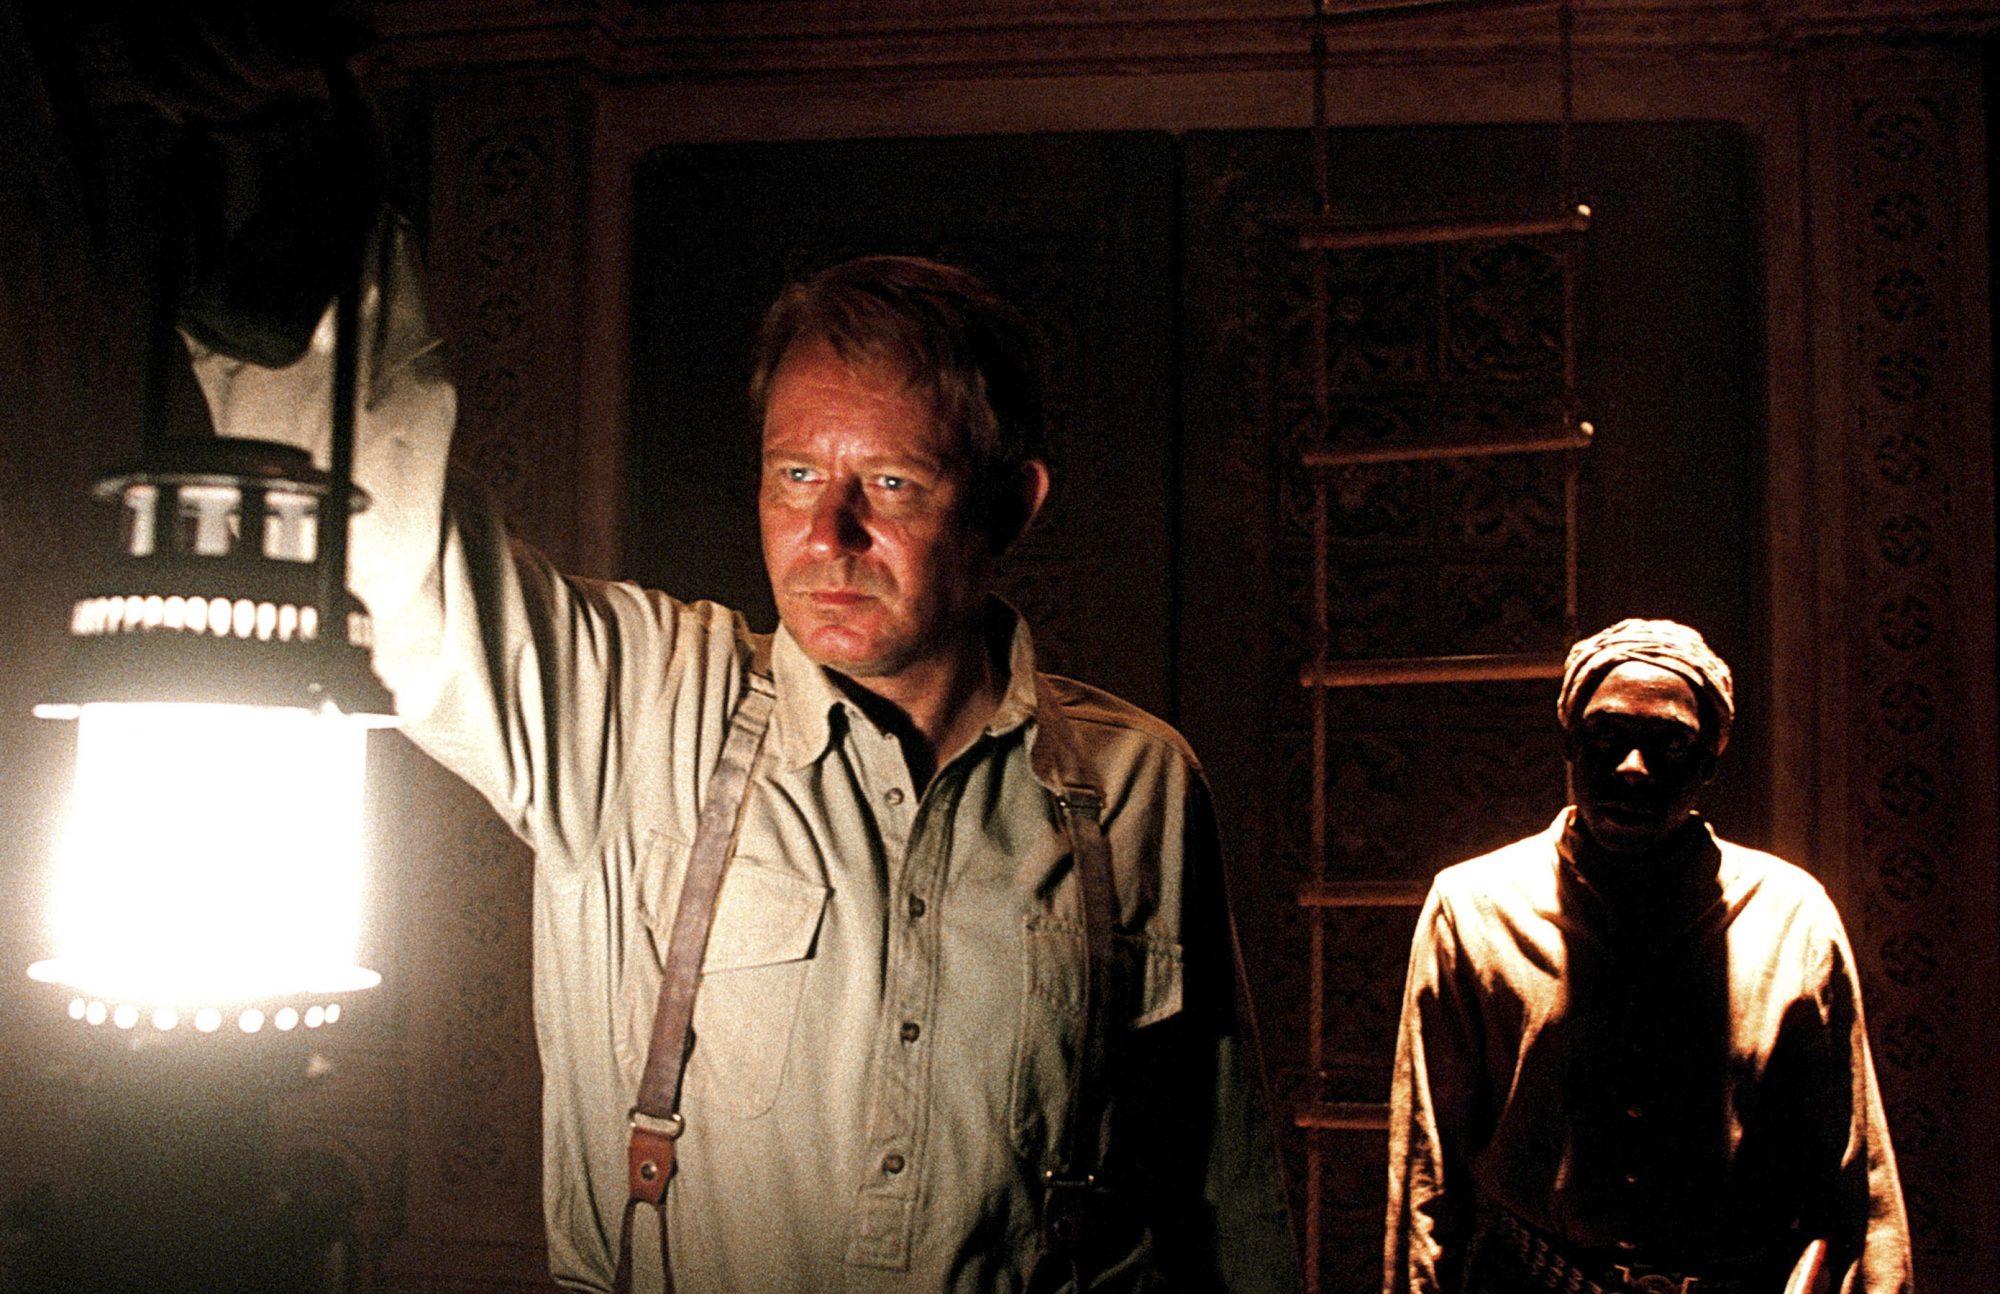 EXORCIST: THE BEGINNING, Stellan Skarsgard, Andrew French, 2004, (c) Warner Brothers/courtesy Everet